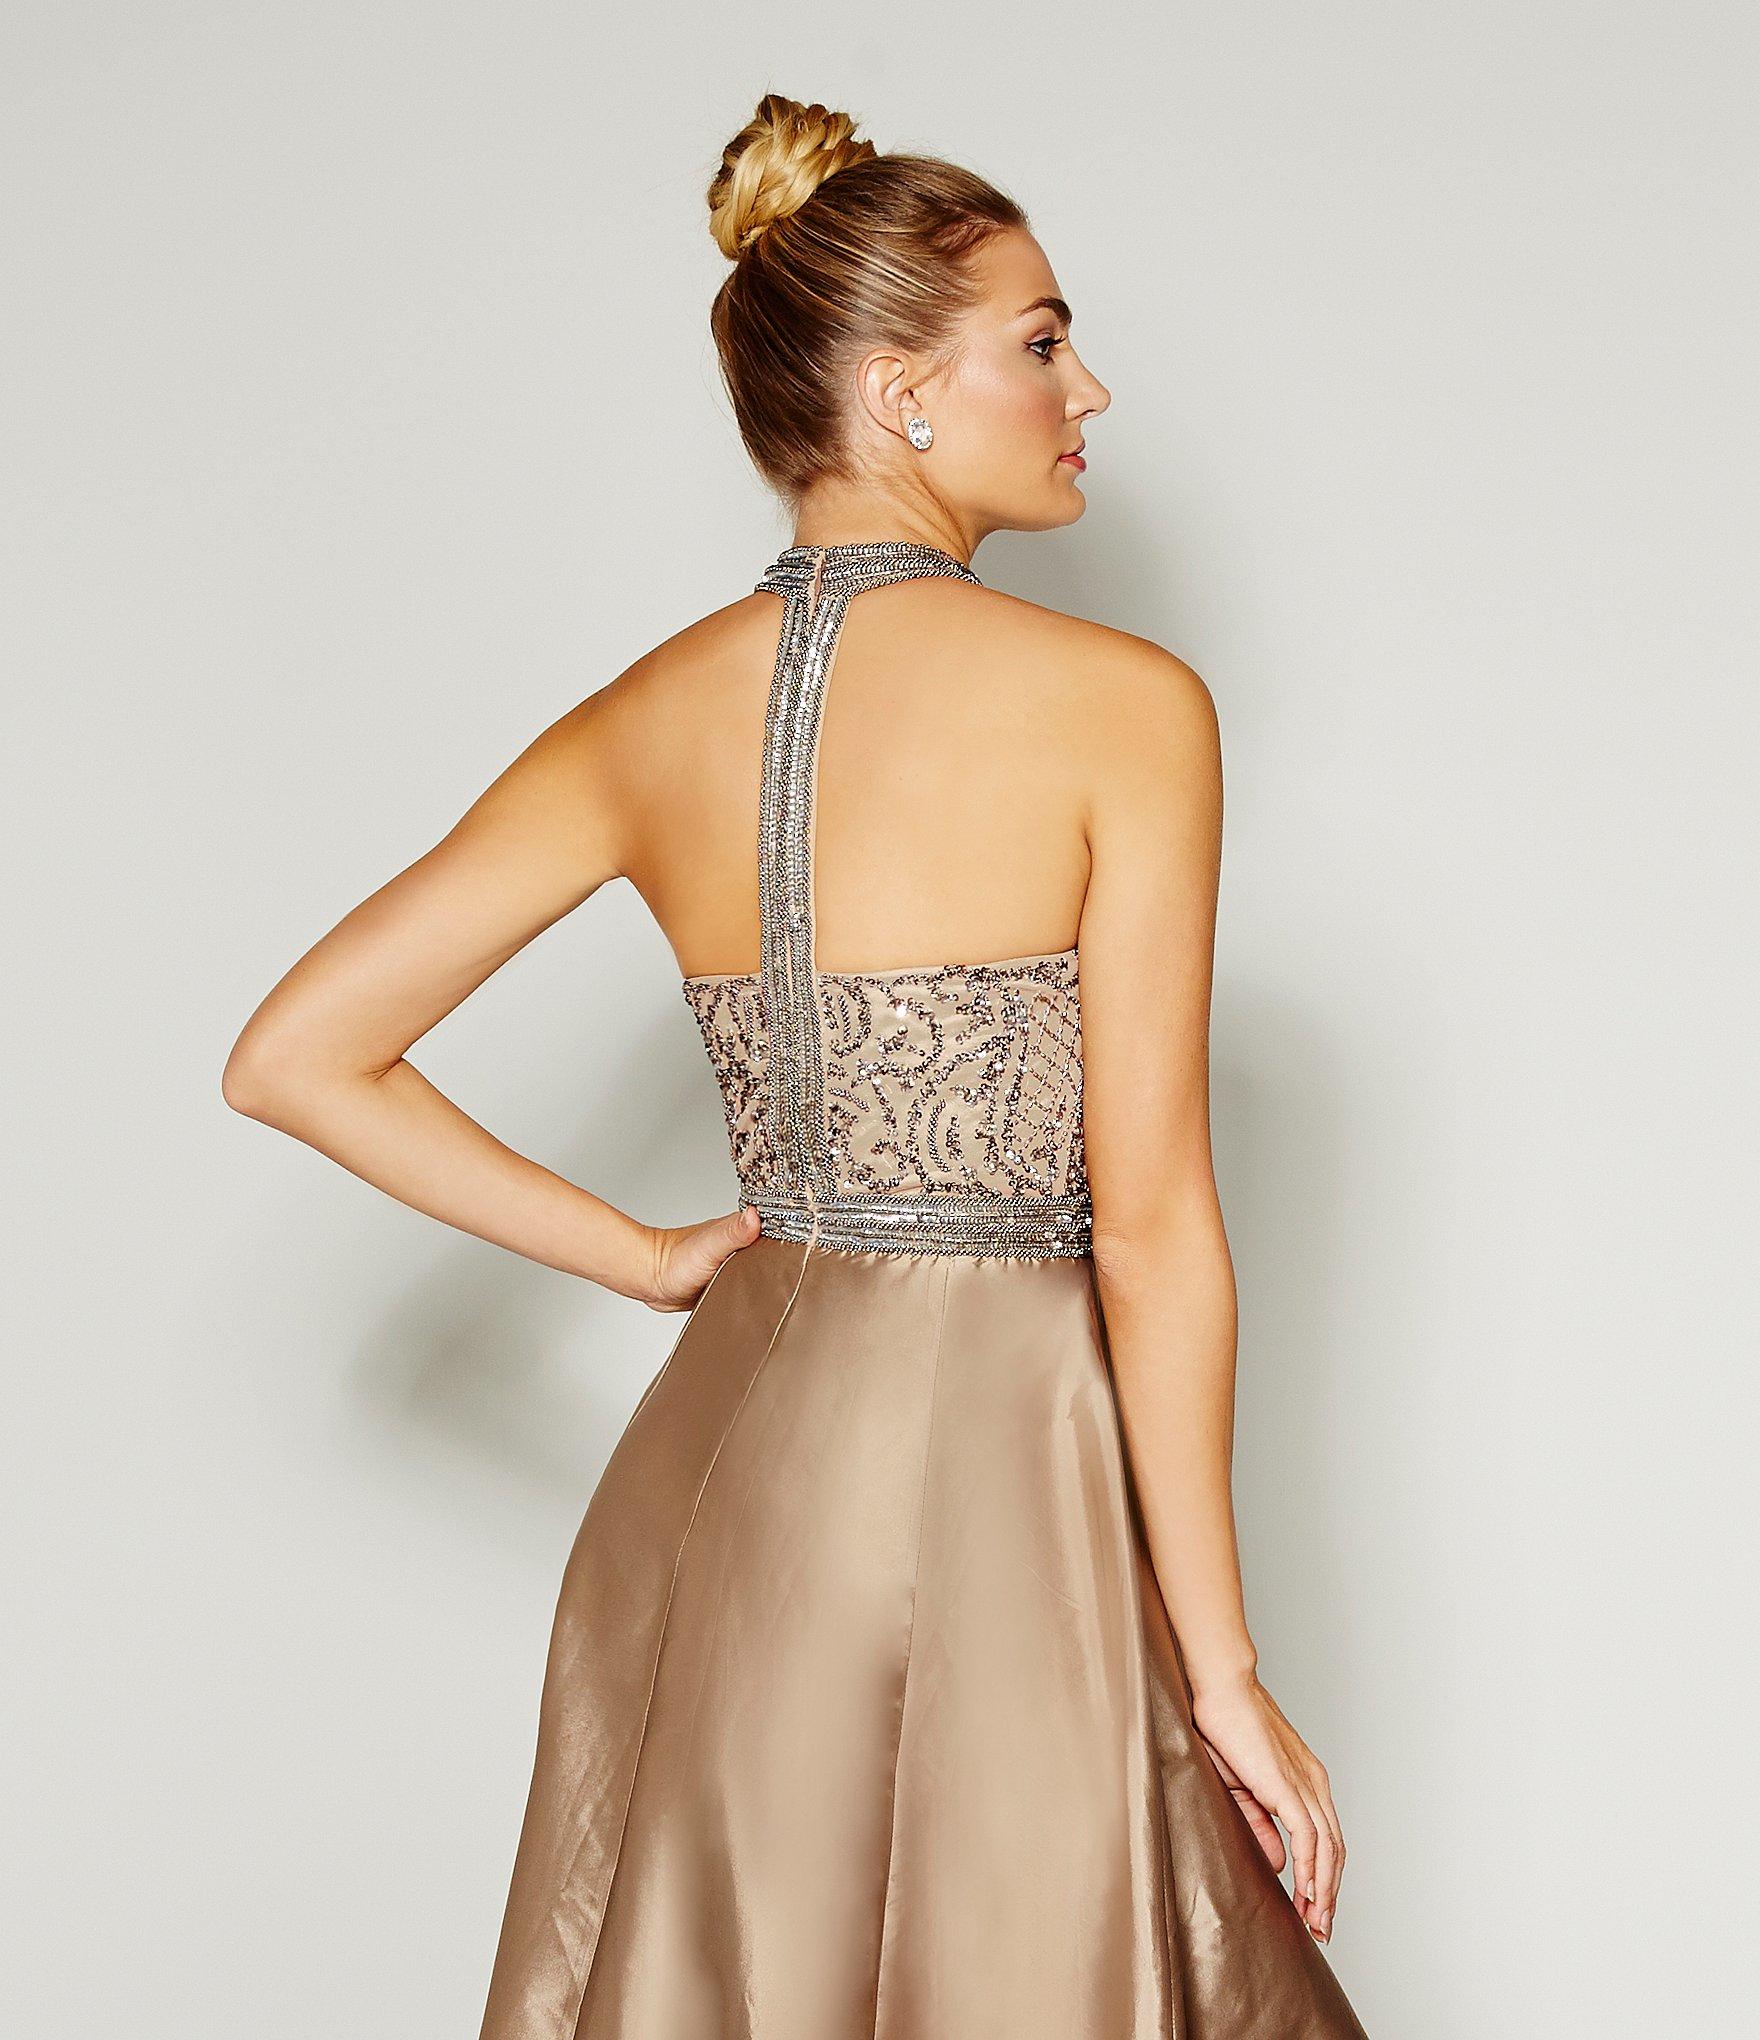 Lyst - Adrianna Papell Beaded Halter Hi-low Gown in Metallic